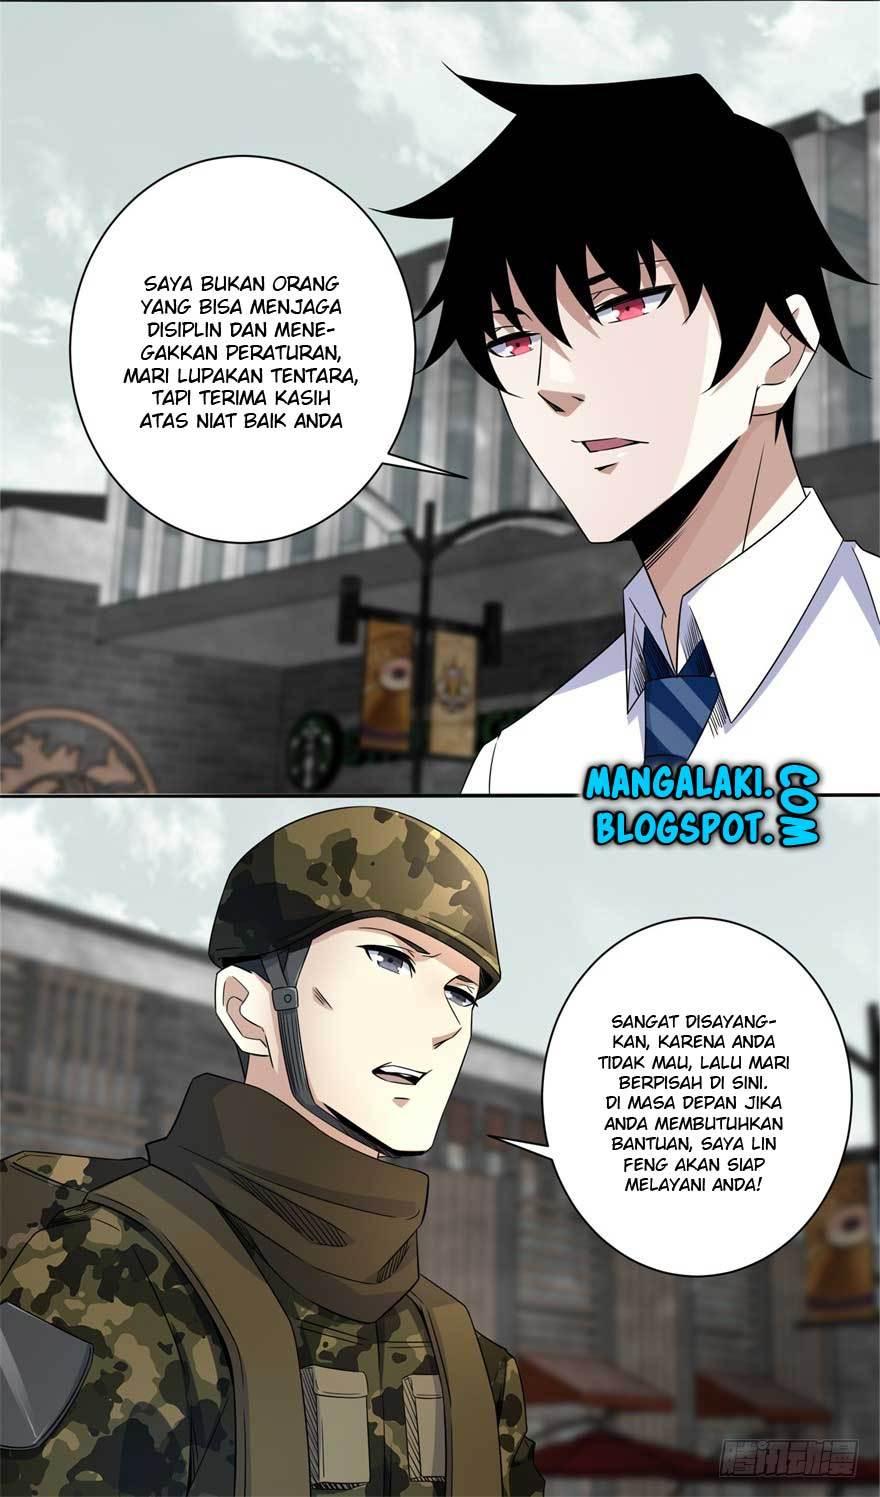 Dilarang COPAS - situs resmi www.mangacanblog.com - Komik king of apocalypse 026 - chapter 26 27 Indonesia king of apocalypse 026 - chapter 26 Terbaru 7|Baca Manga Komik Indonesia|Mangacan